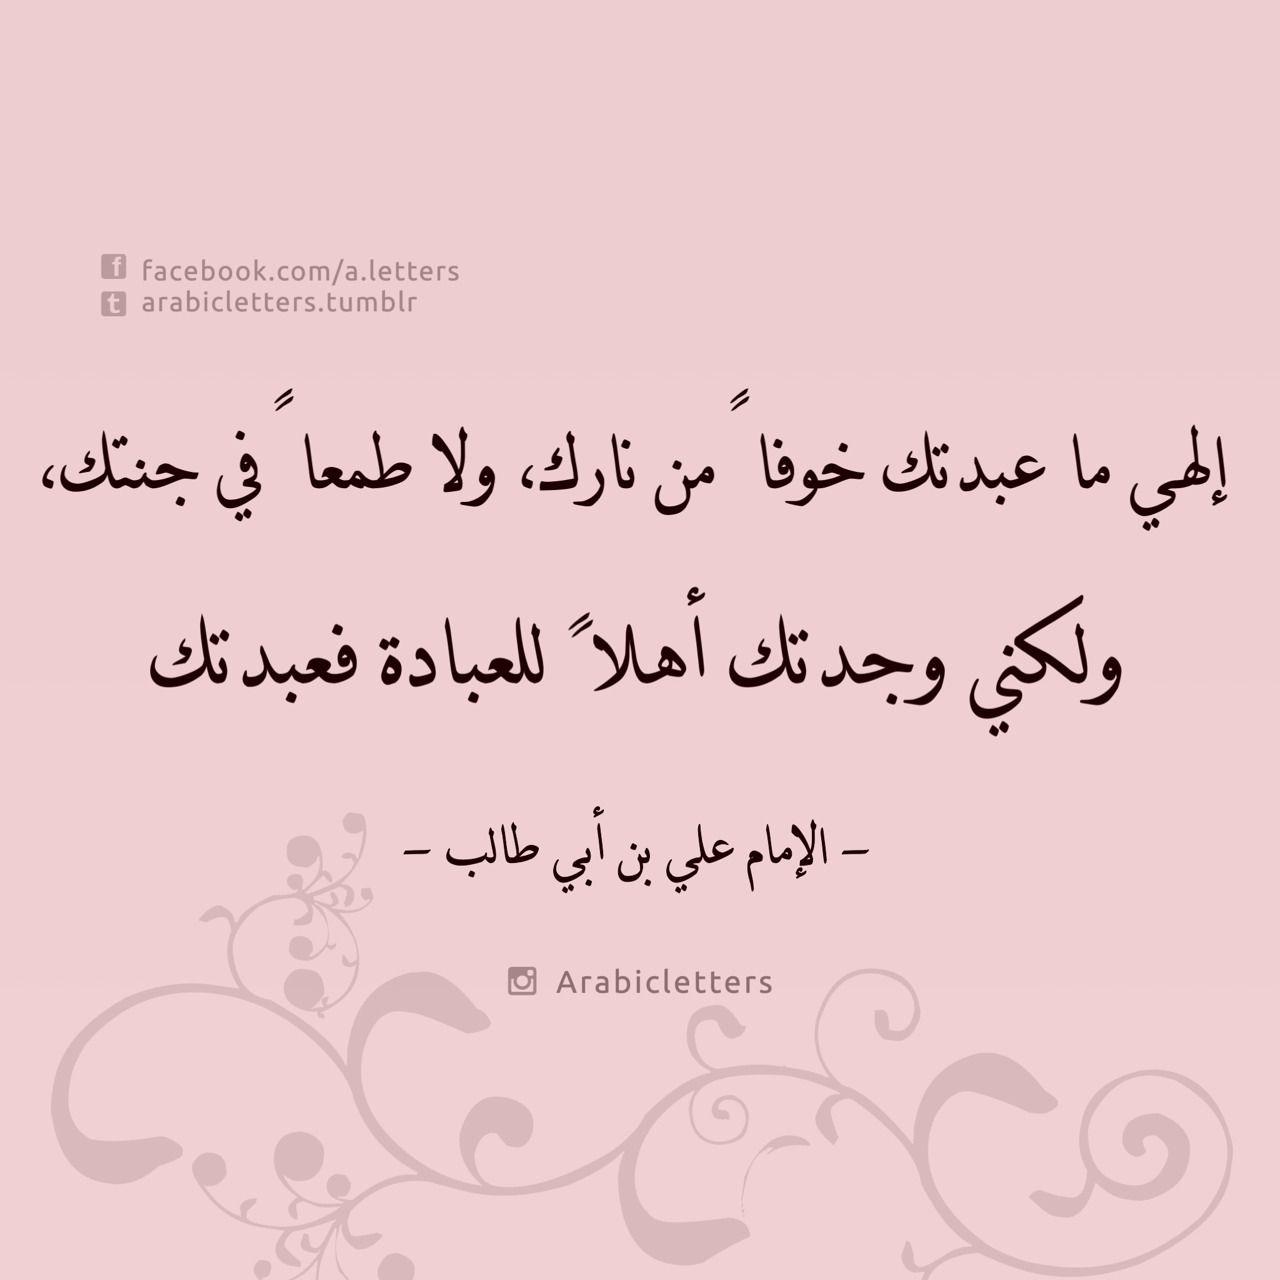 Arabic Letters الإمام علي بن أبي طالب Islamic Inspirational Quotes Ali Quotes Islam Facts